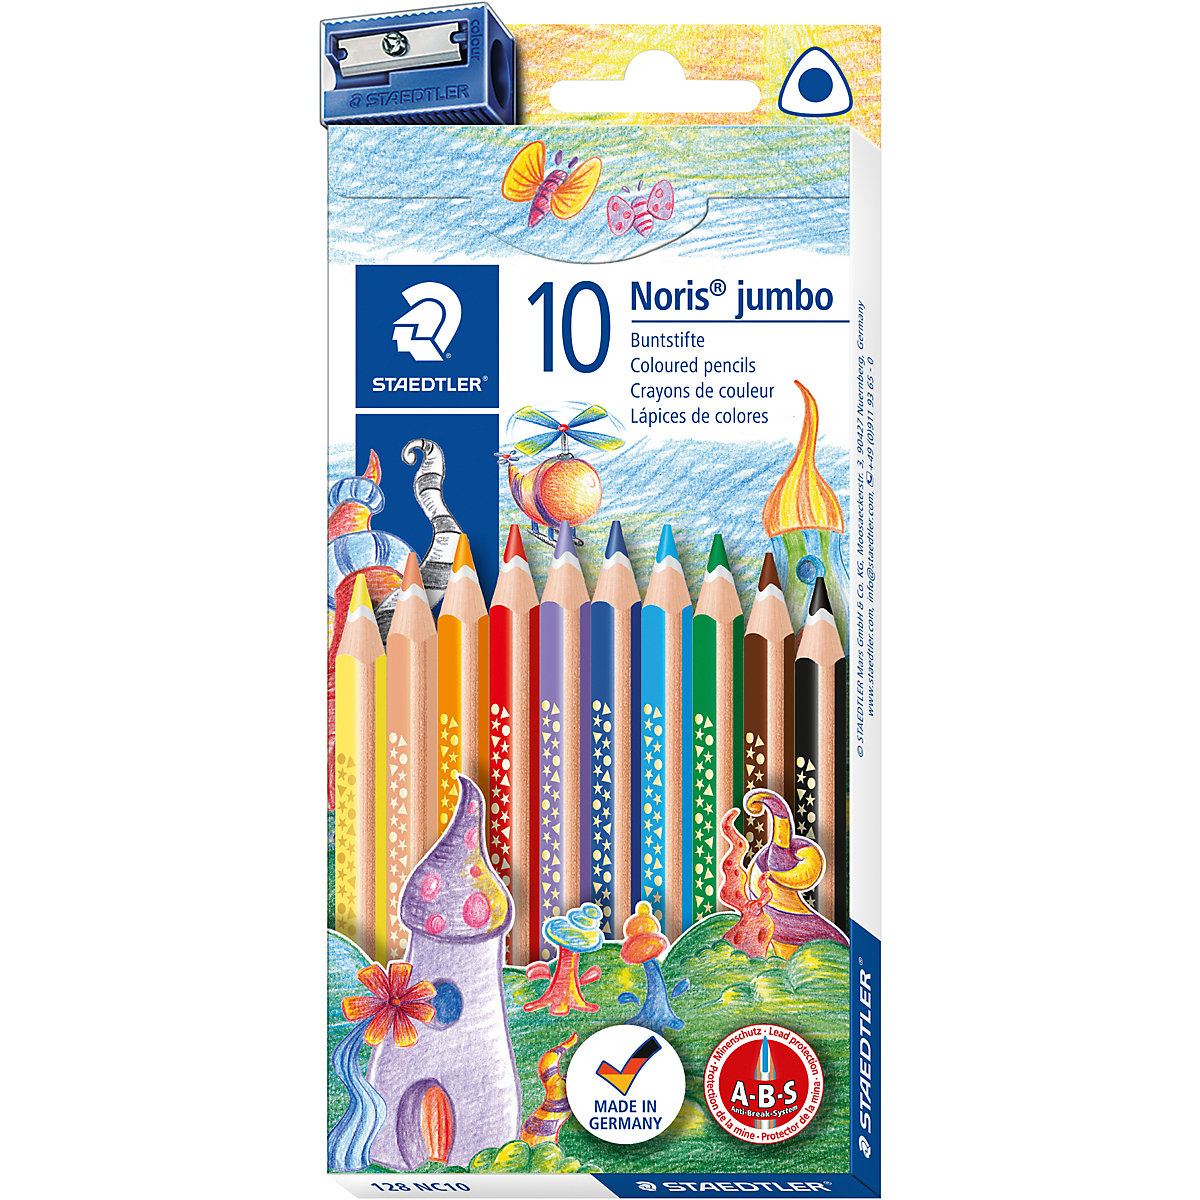 Lápices de colores de madera 2031225 kits creativos lápiz de dibujo MTpromo